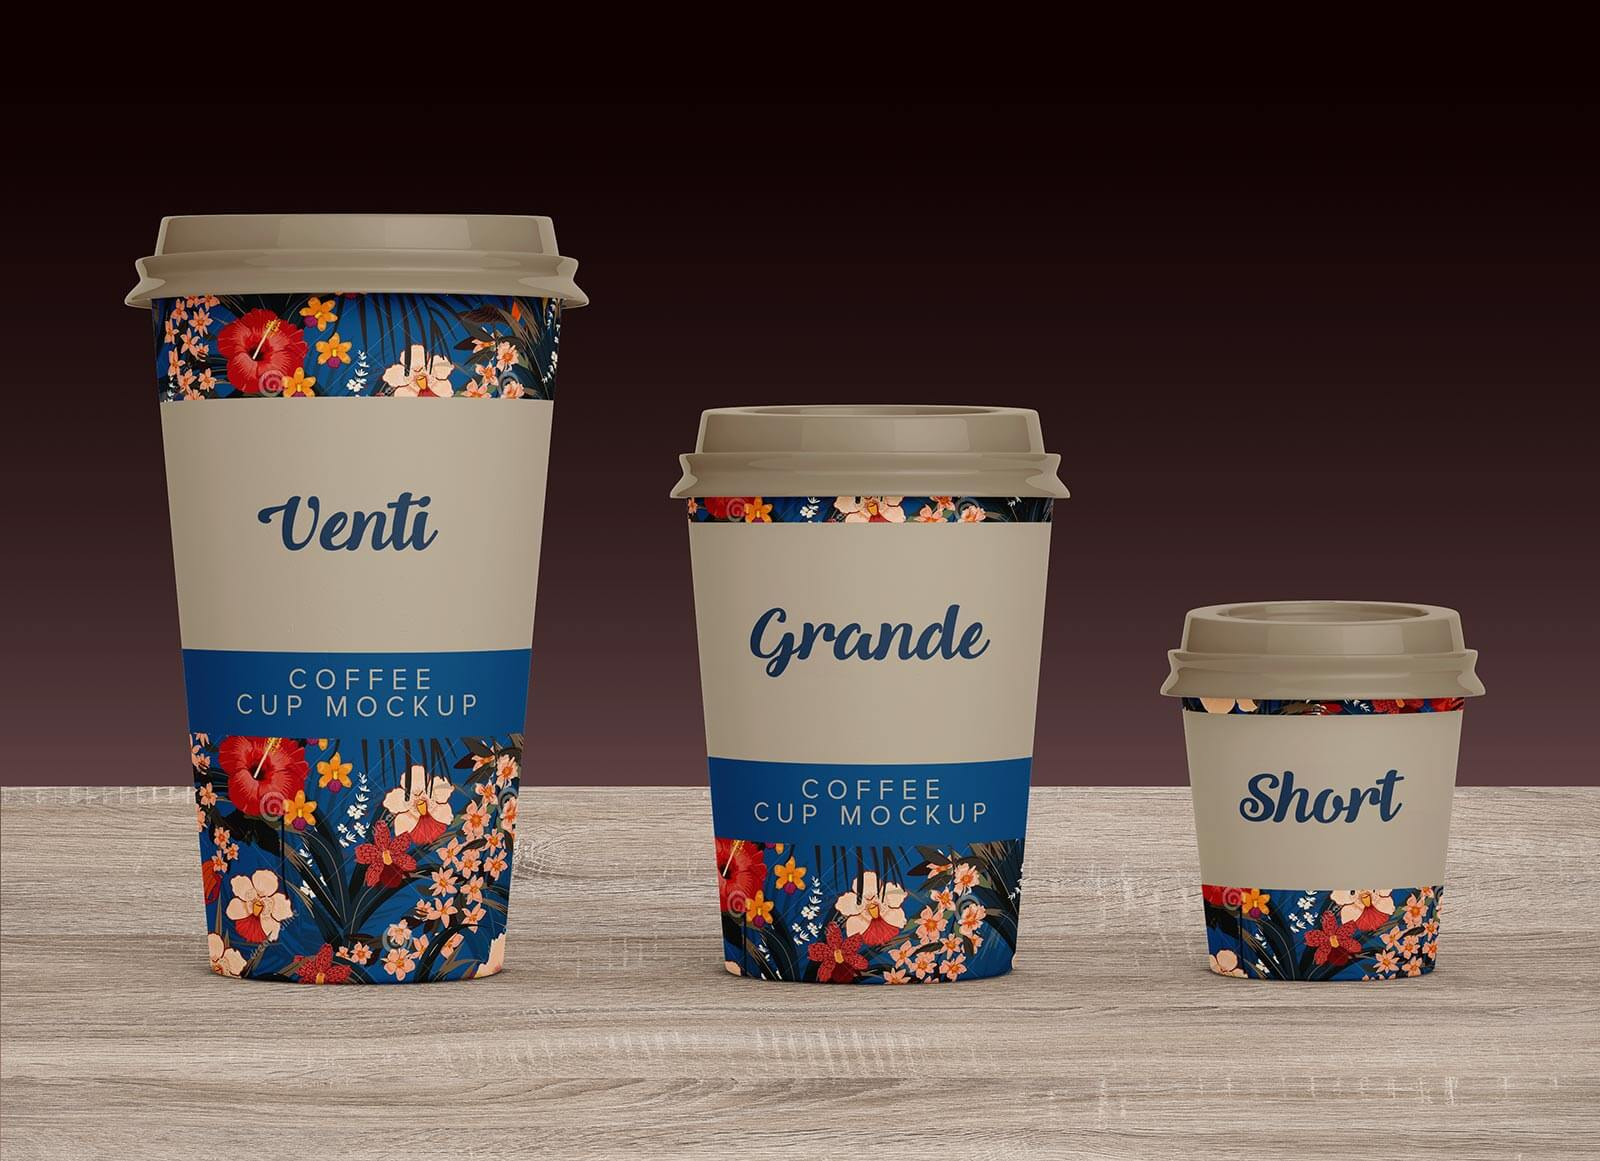 Free Venti, Grande & Short Paper Coffee Cup Mockup PSD Set (1)